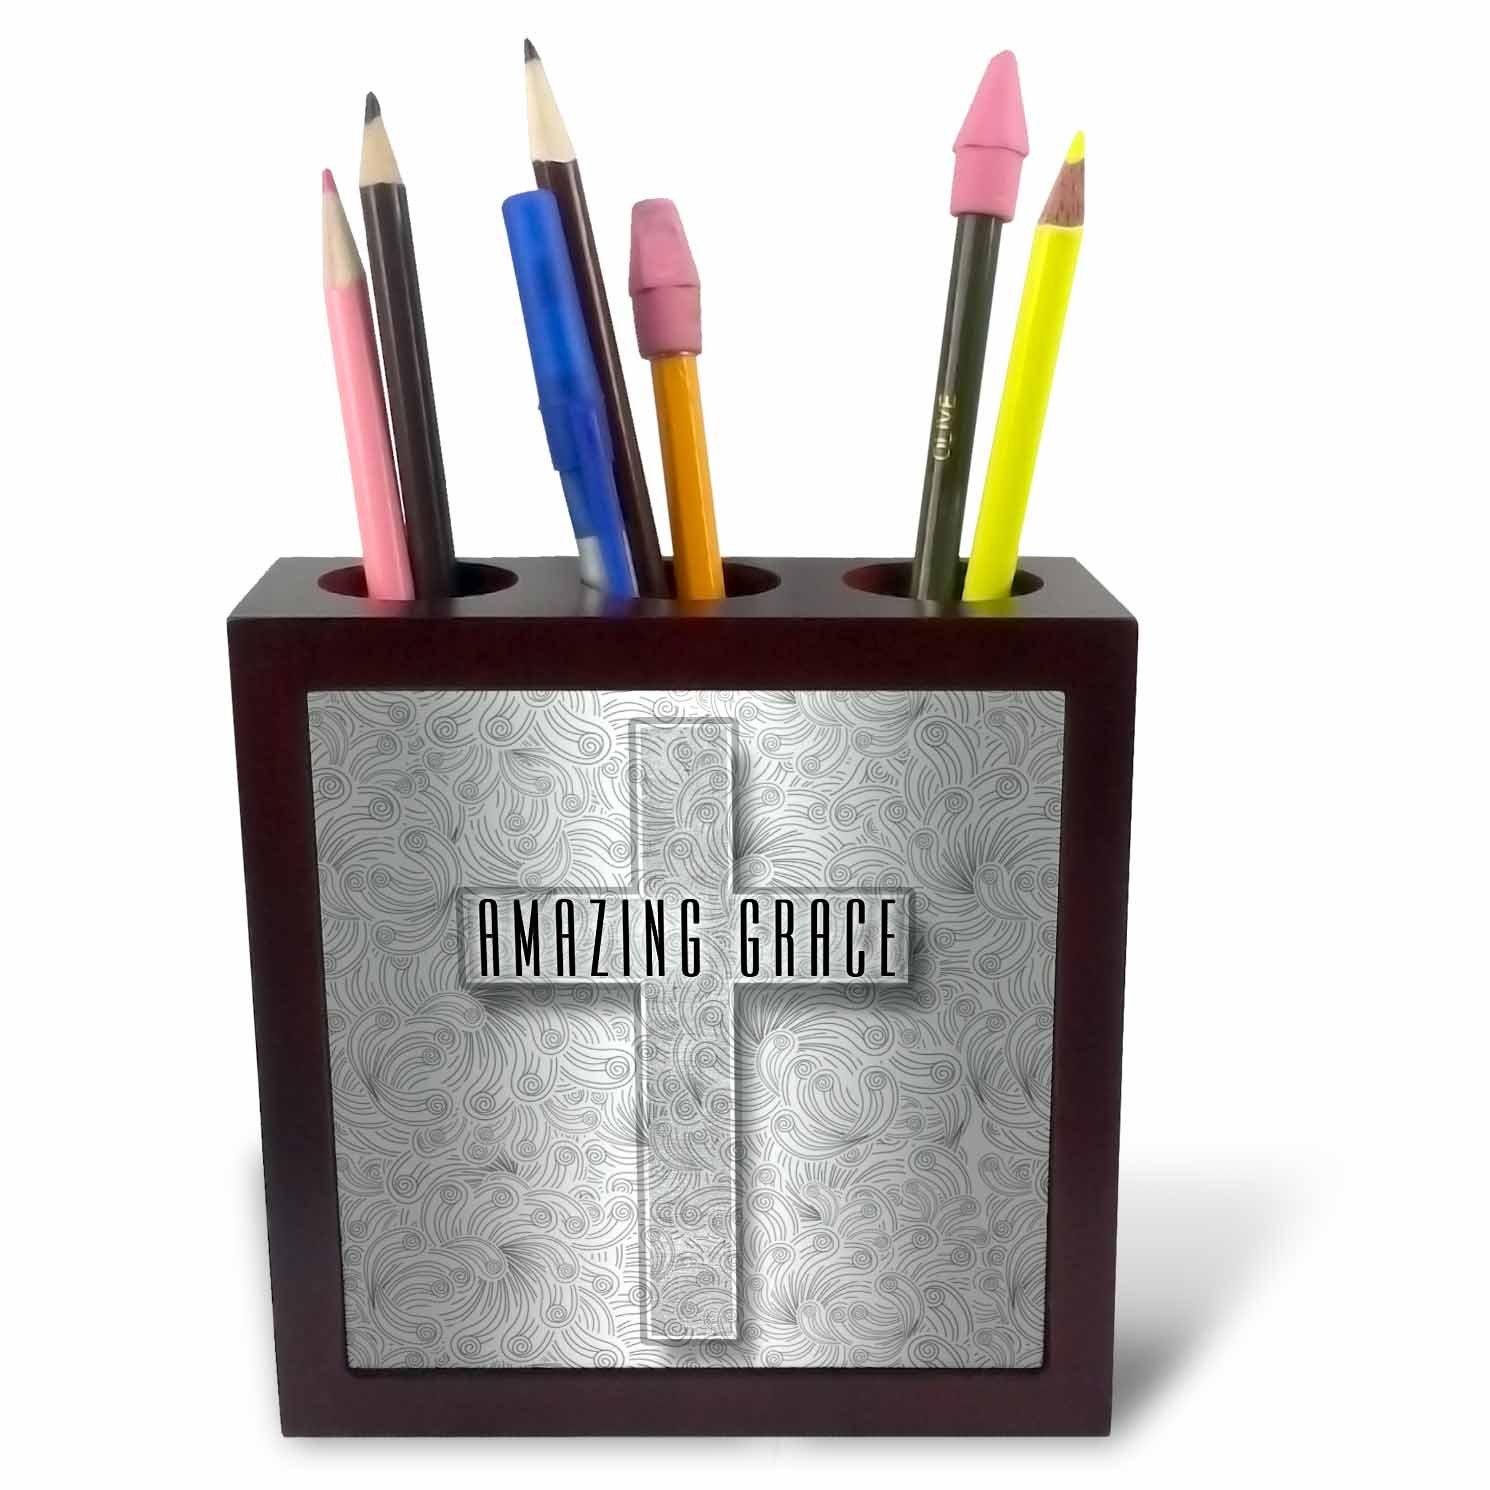 3dRose Doreen Erhardt Inspirational - Amazing Grace Silver Christian Cross with Swirls Elegant and Simple - 5 inch tile pen holder (ph_264281_1)